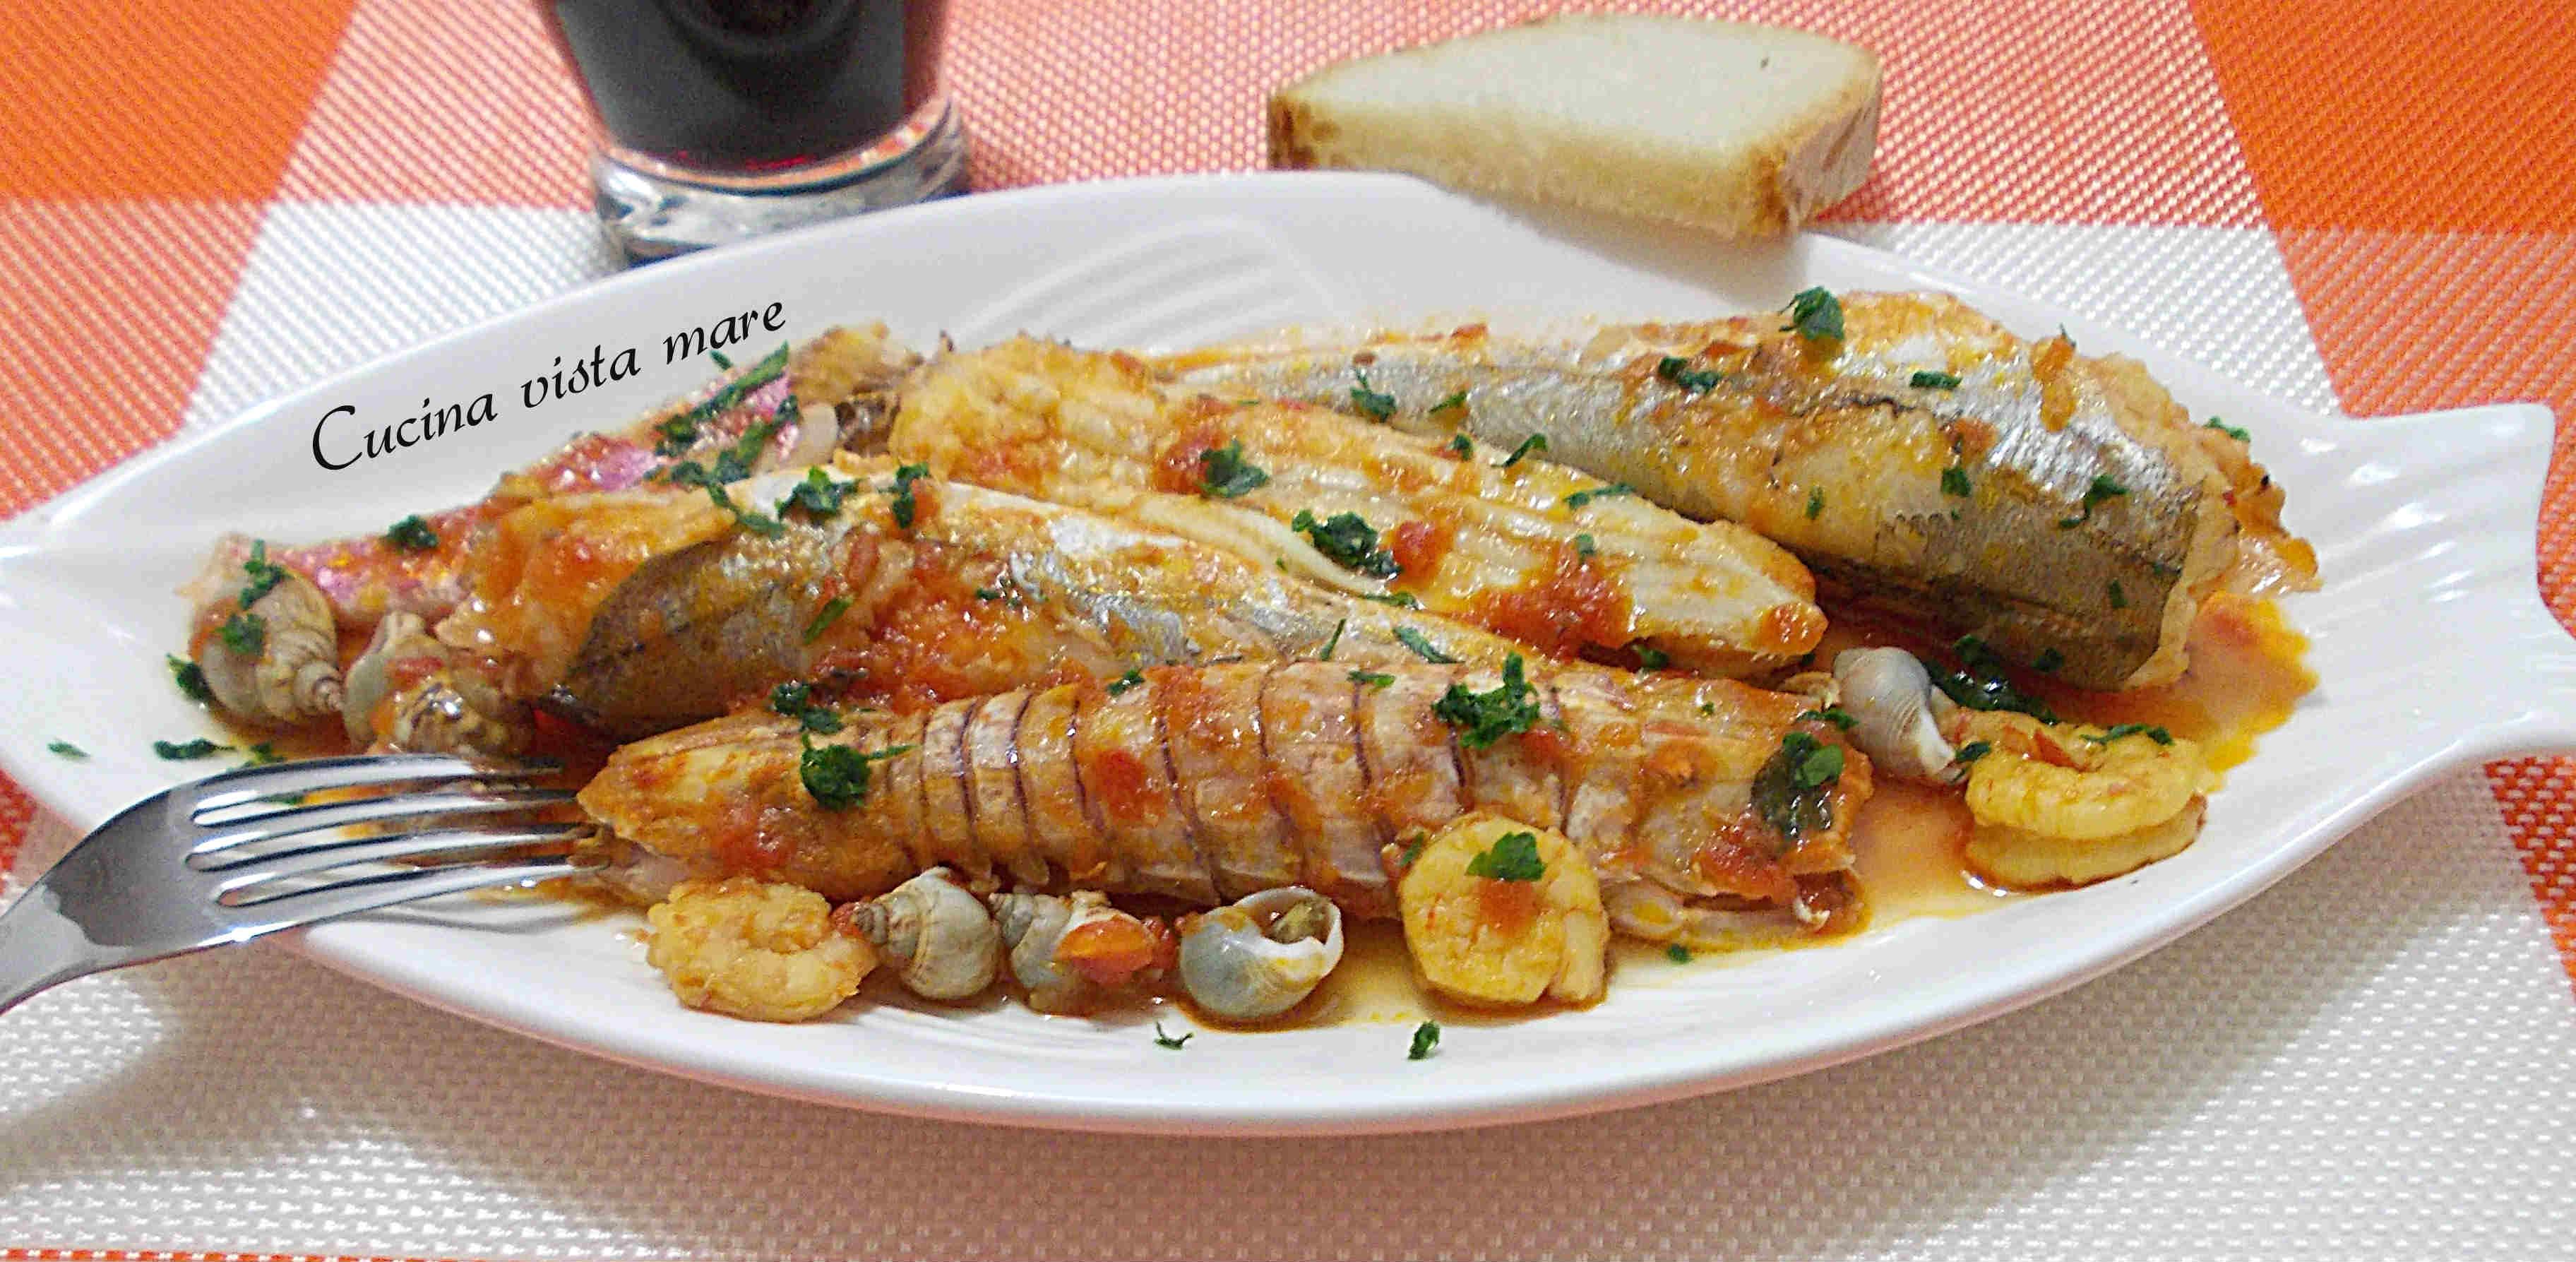 Brodetto Di Pesce Cucina Vista Mare #B44917 3648 1787 Foto Di Mattonelle Per Cucina